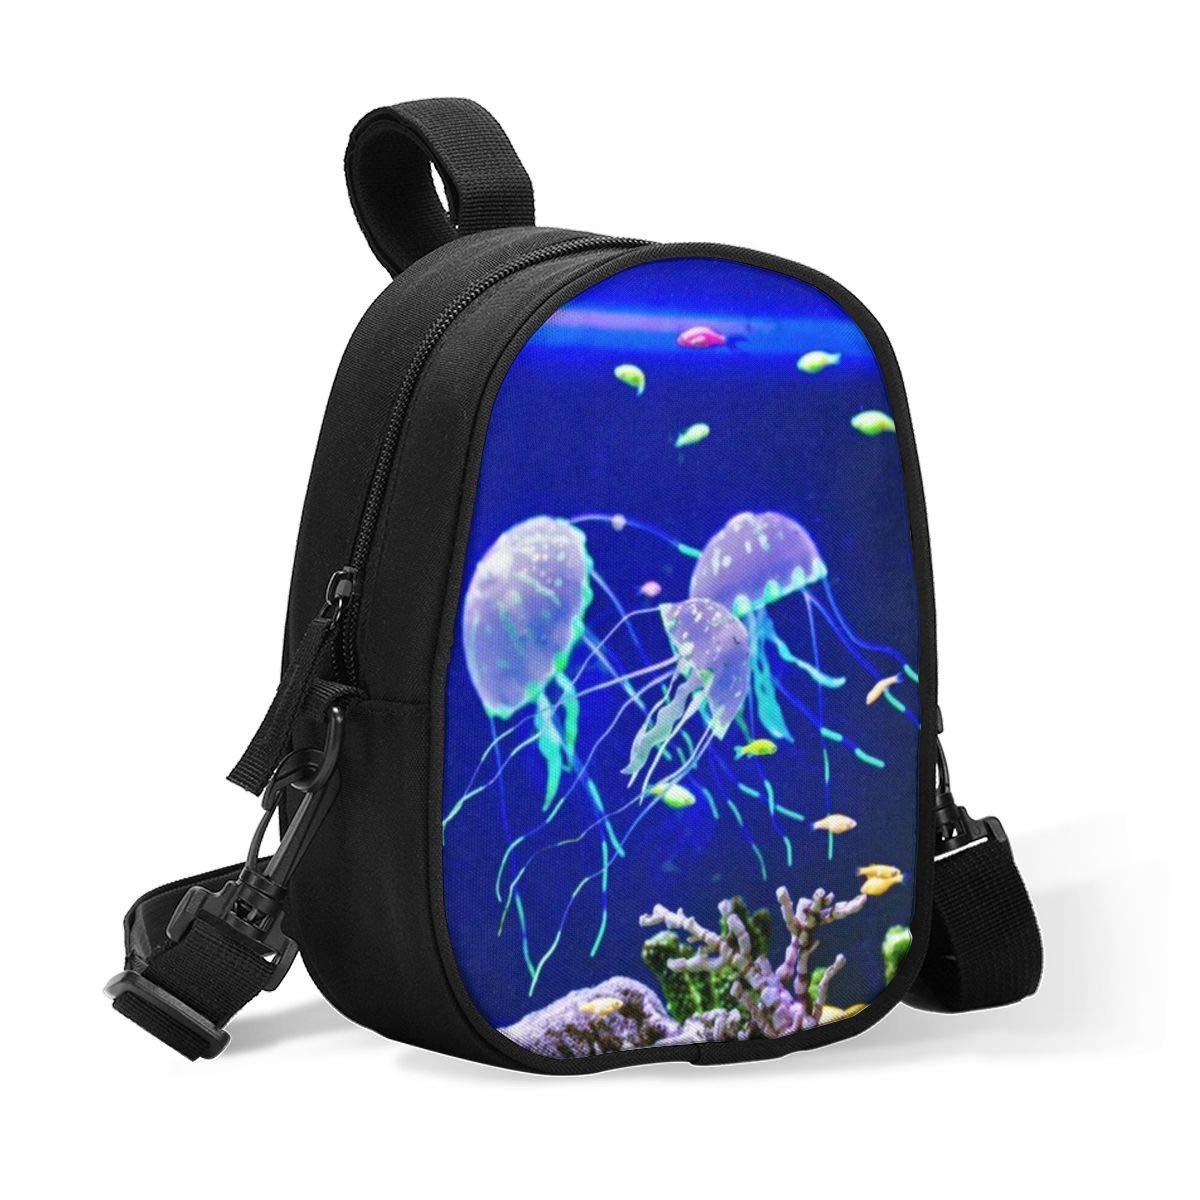 Insulated Baby Bottle Storage Cooler Bag Underwater Coral Jellyfish Breastmilk Cooler, Day Care & Lunch Bag for Baby Formula, Breast Milk, Sports Drink - Water Bottle Holder(2 Bottles)